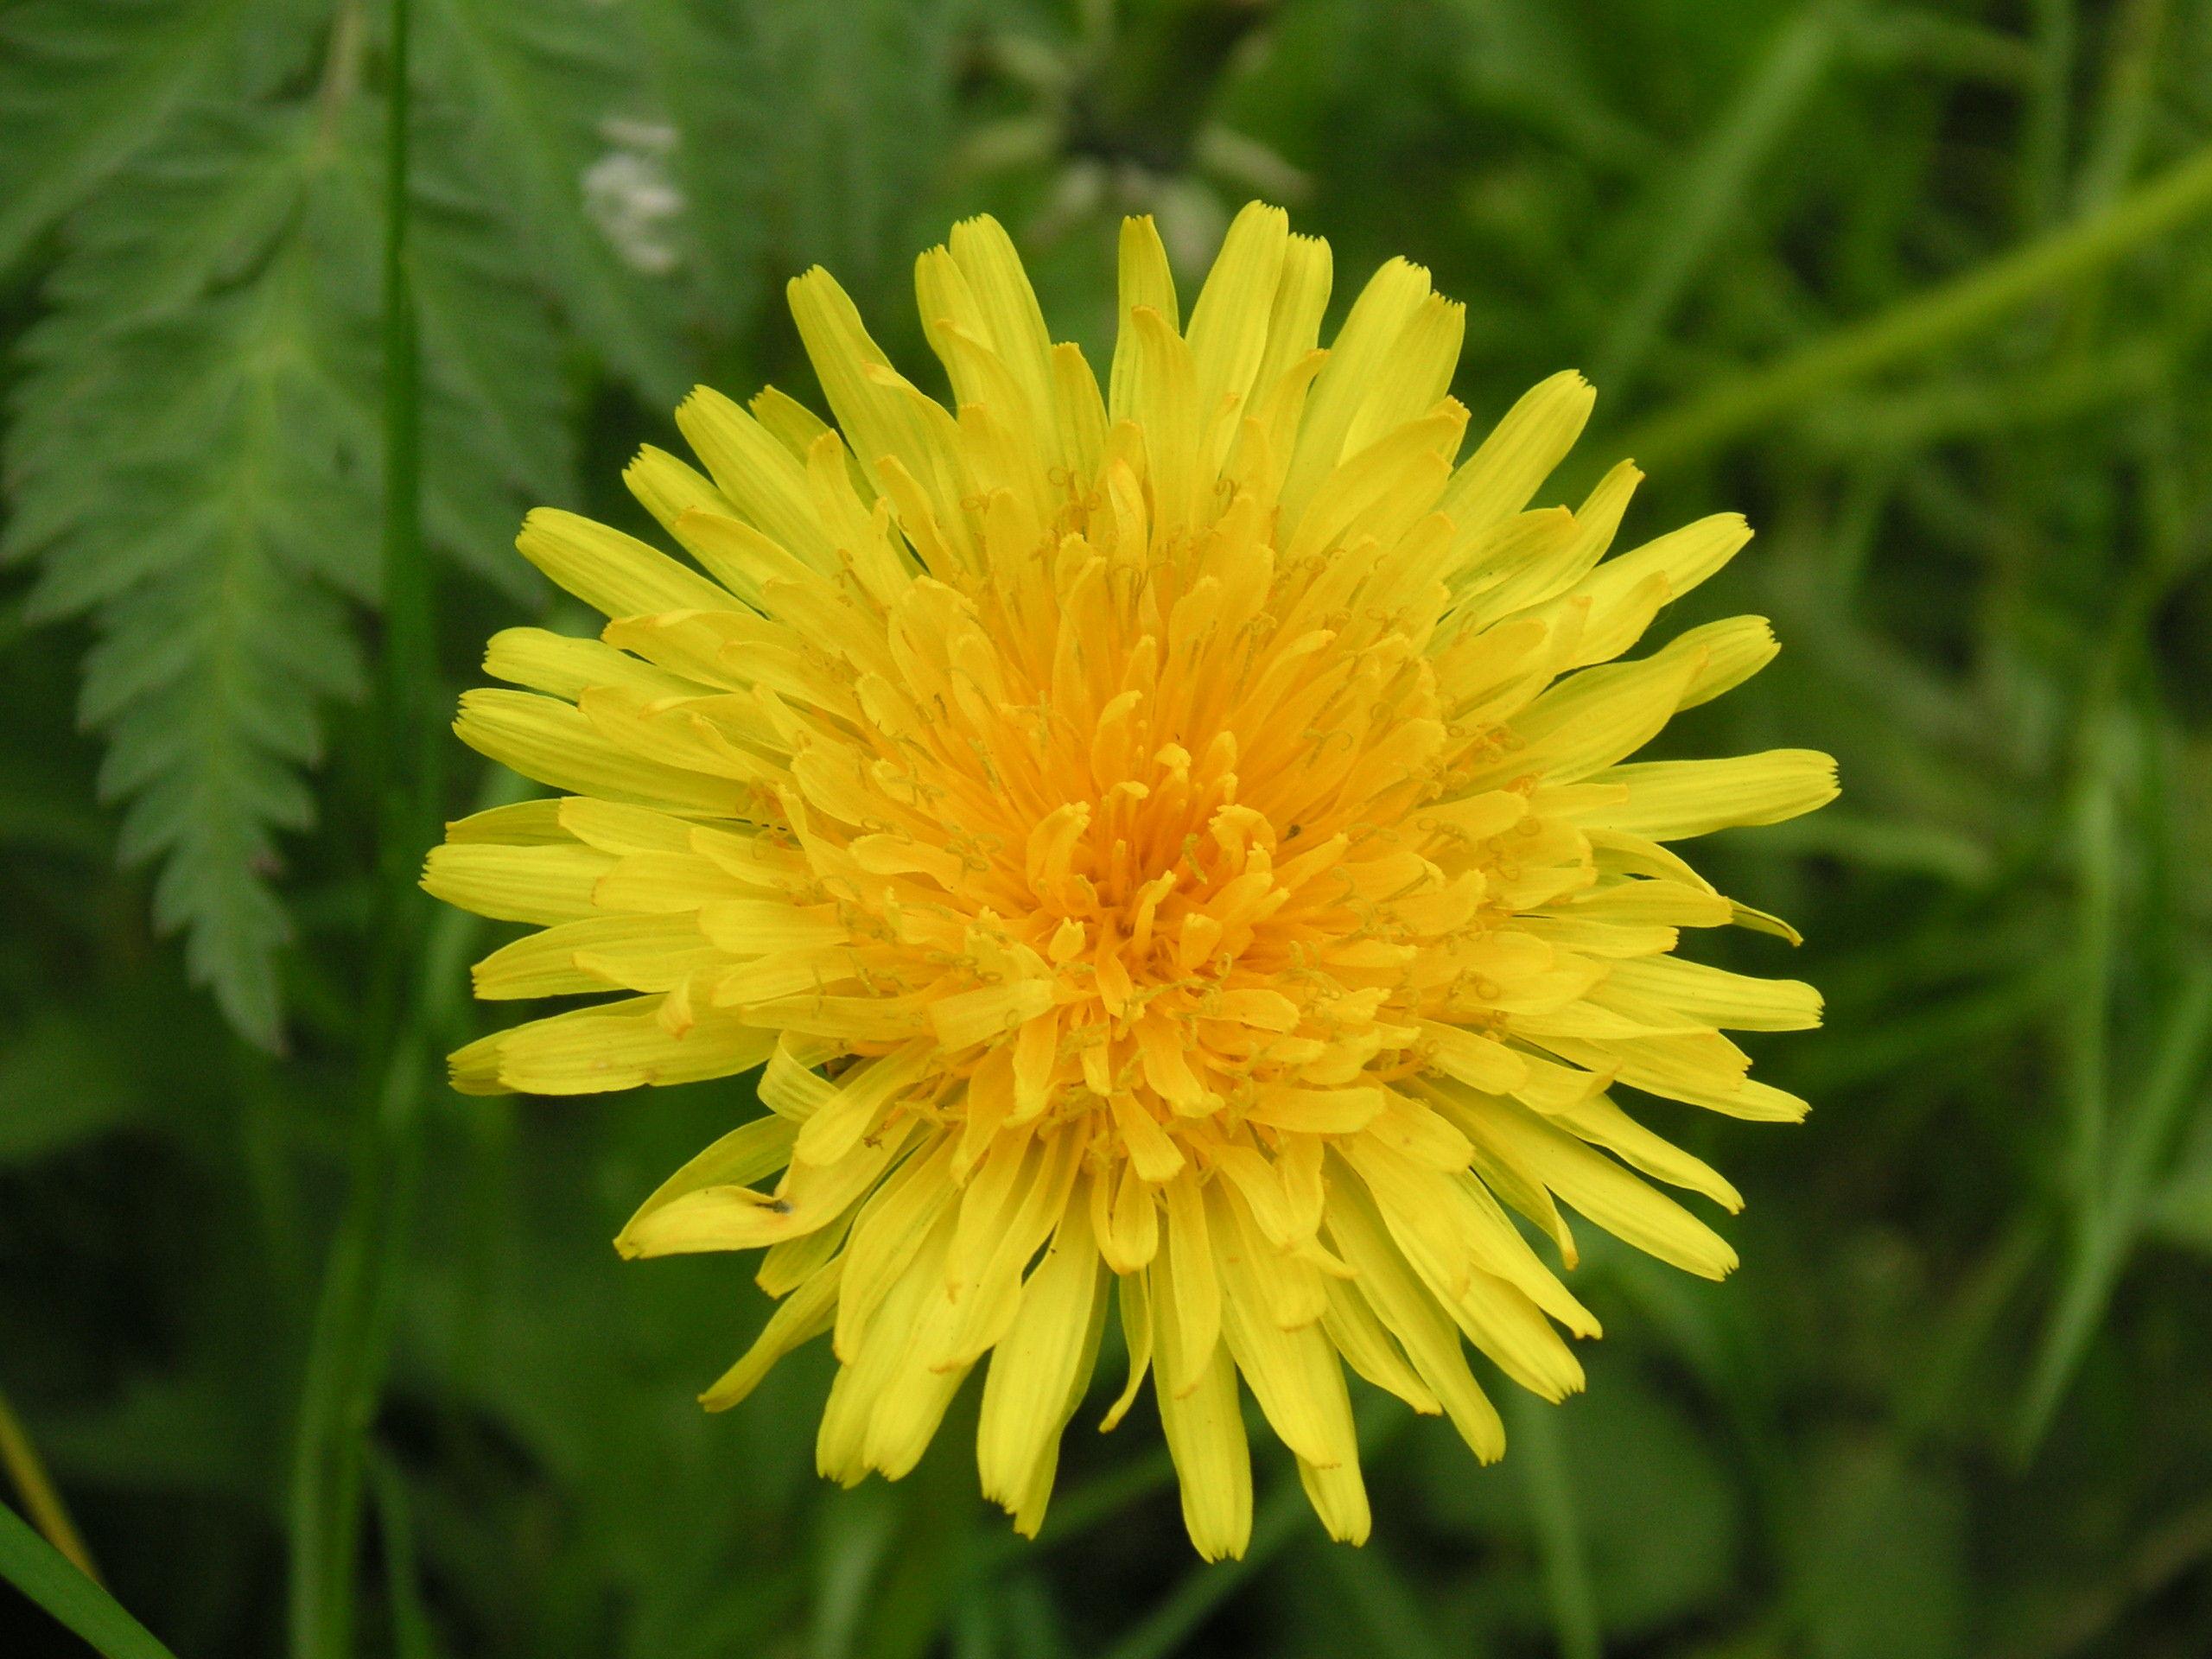 Dandelion Benefits - Be Well Buzz